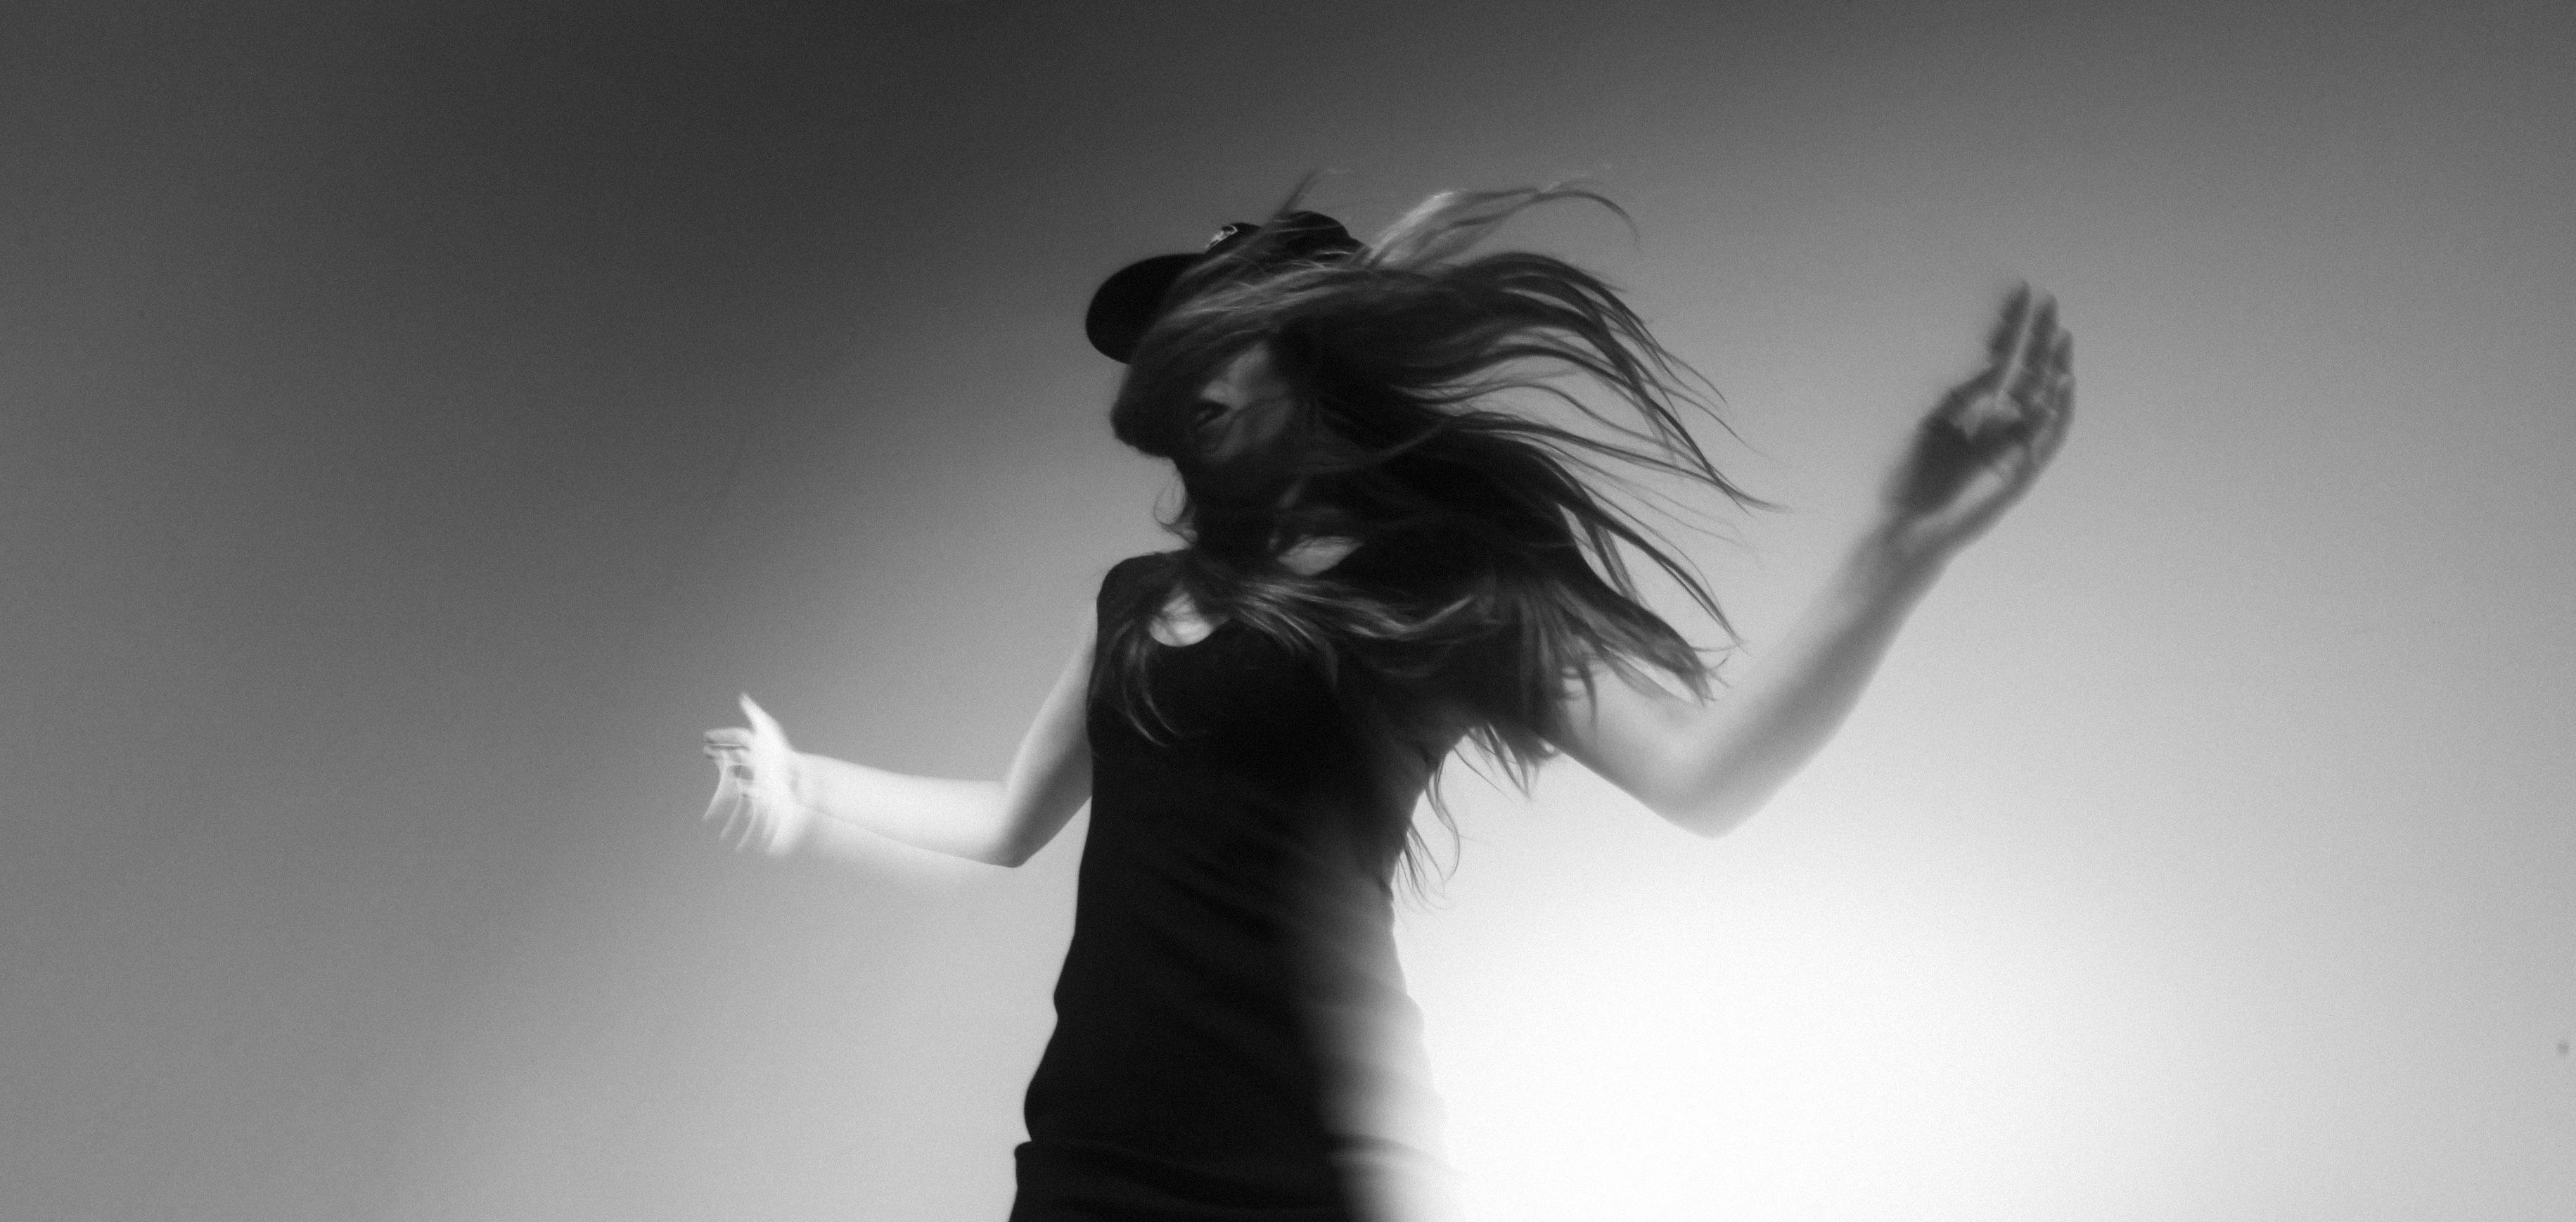 laurel halo dancing promotional photo